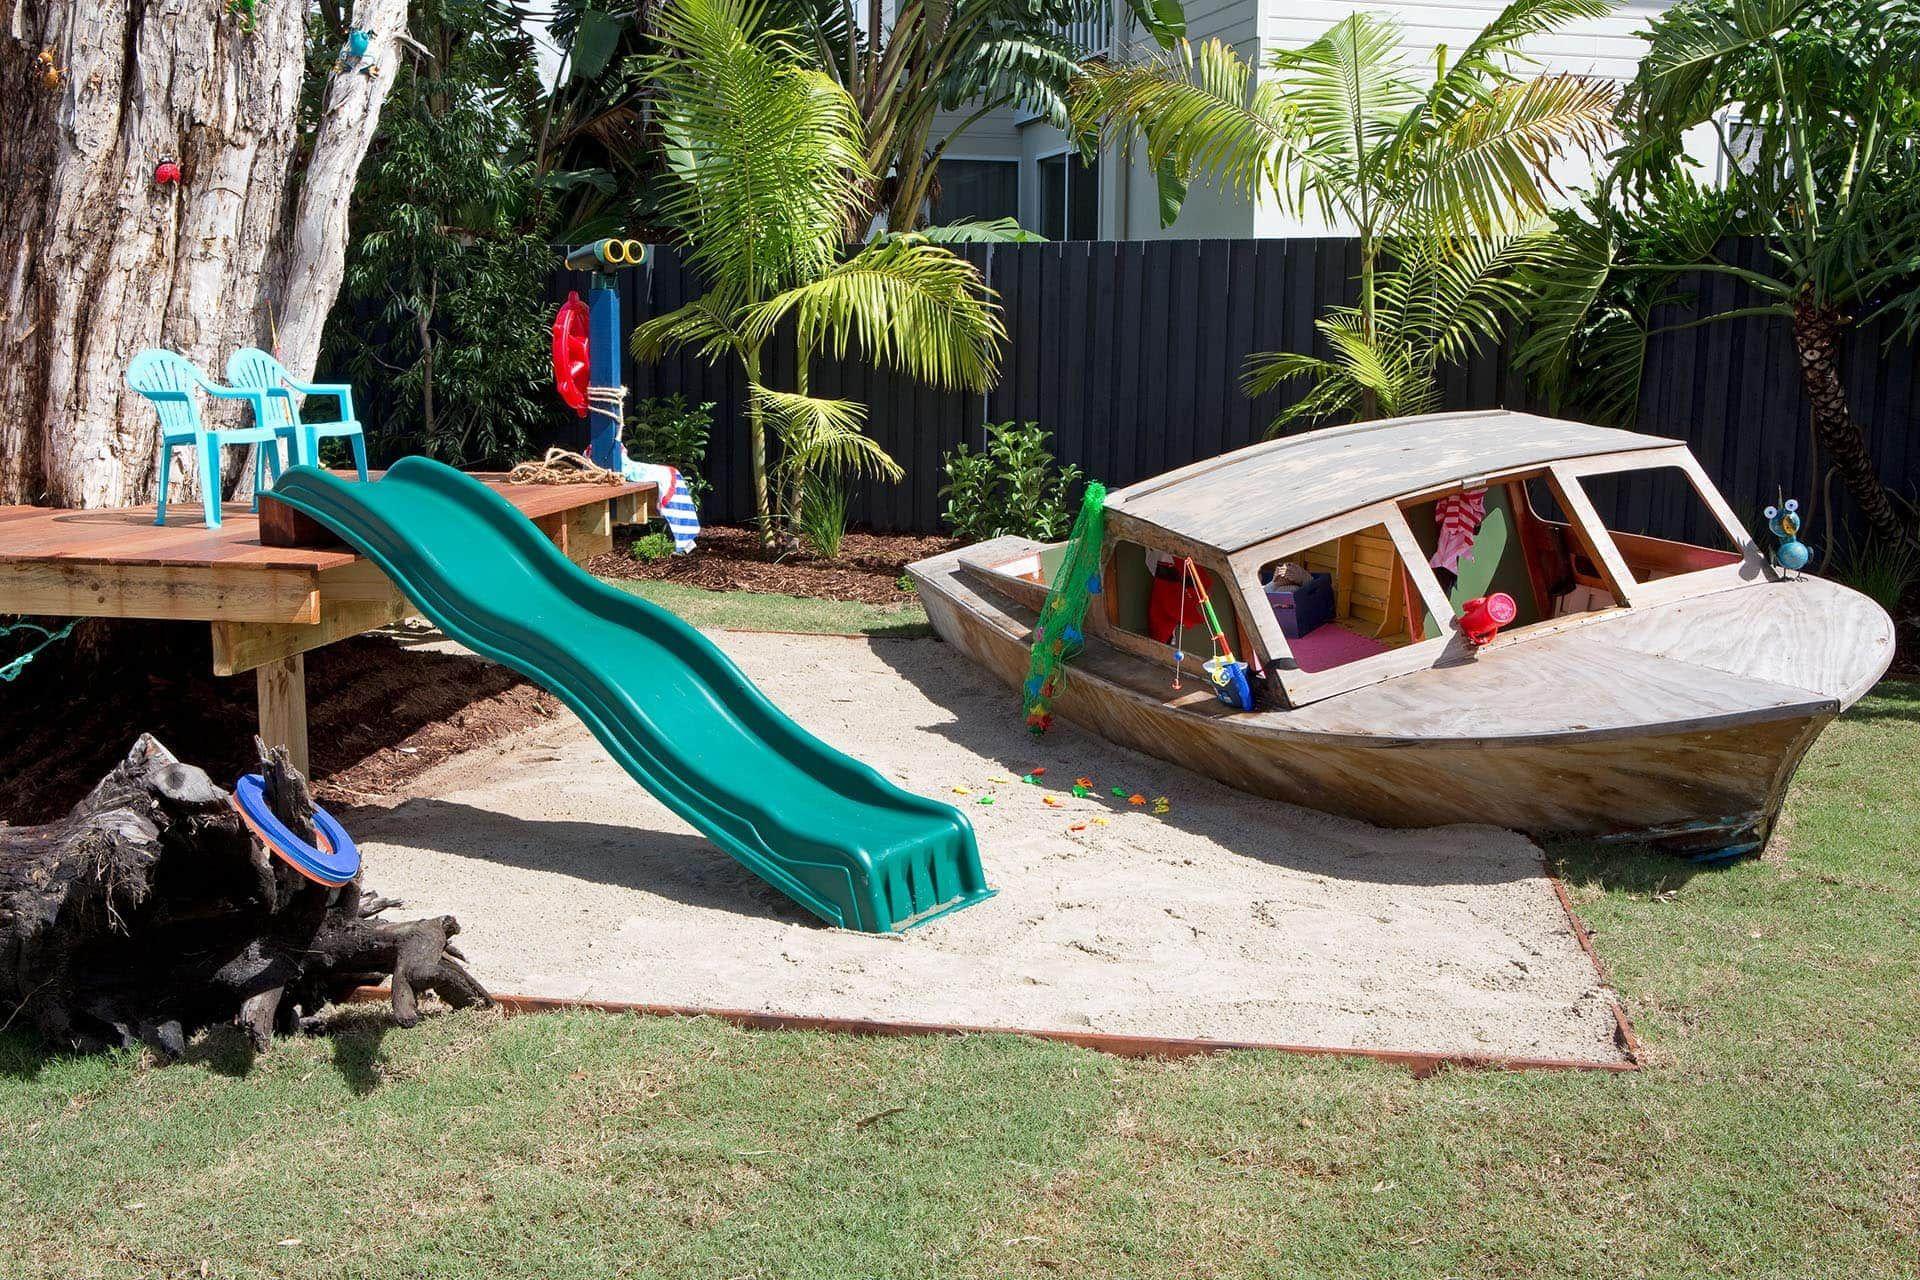 Pin By Zoranda Natalia On Backyarrrddd Backyard Kids Yard